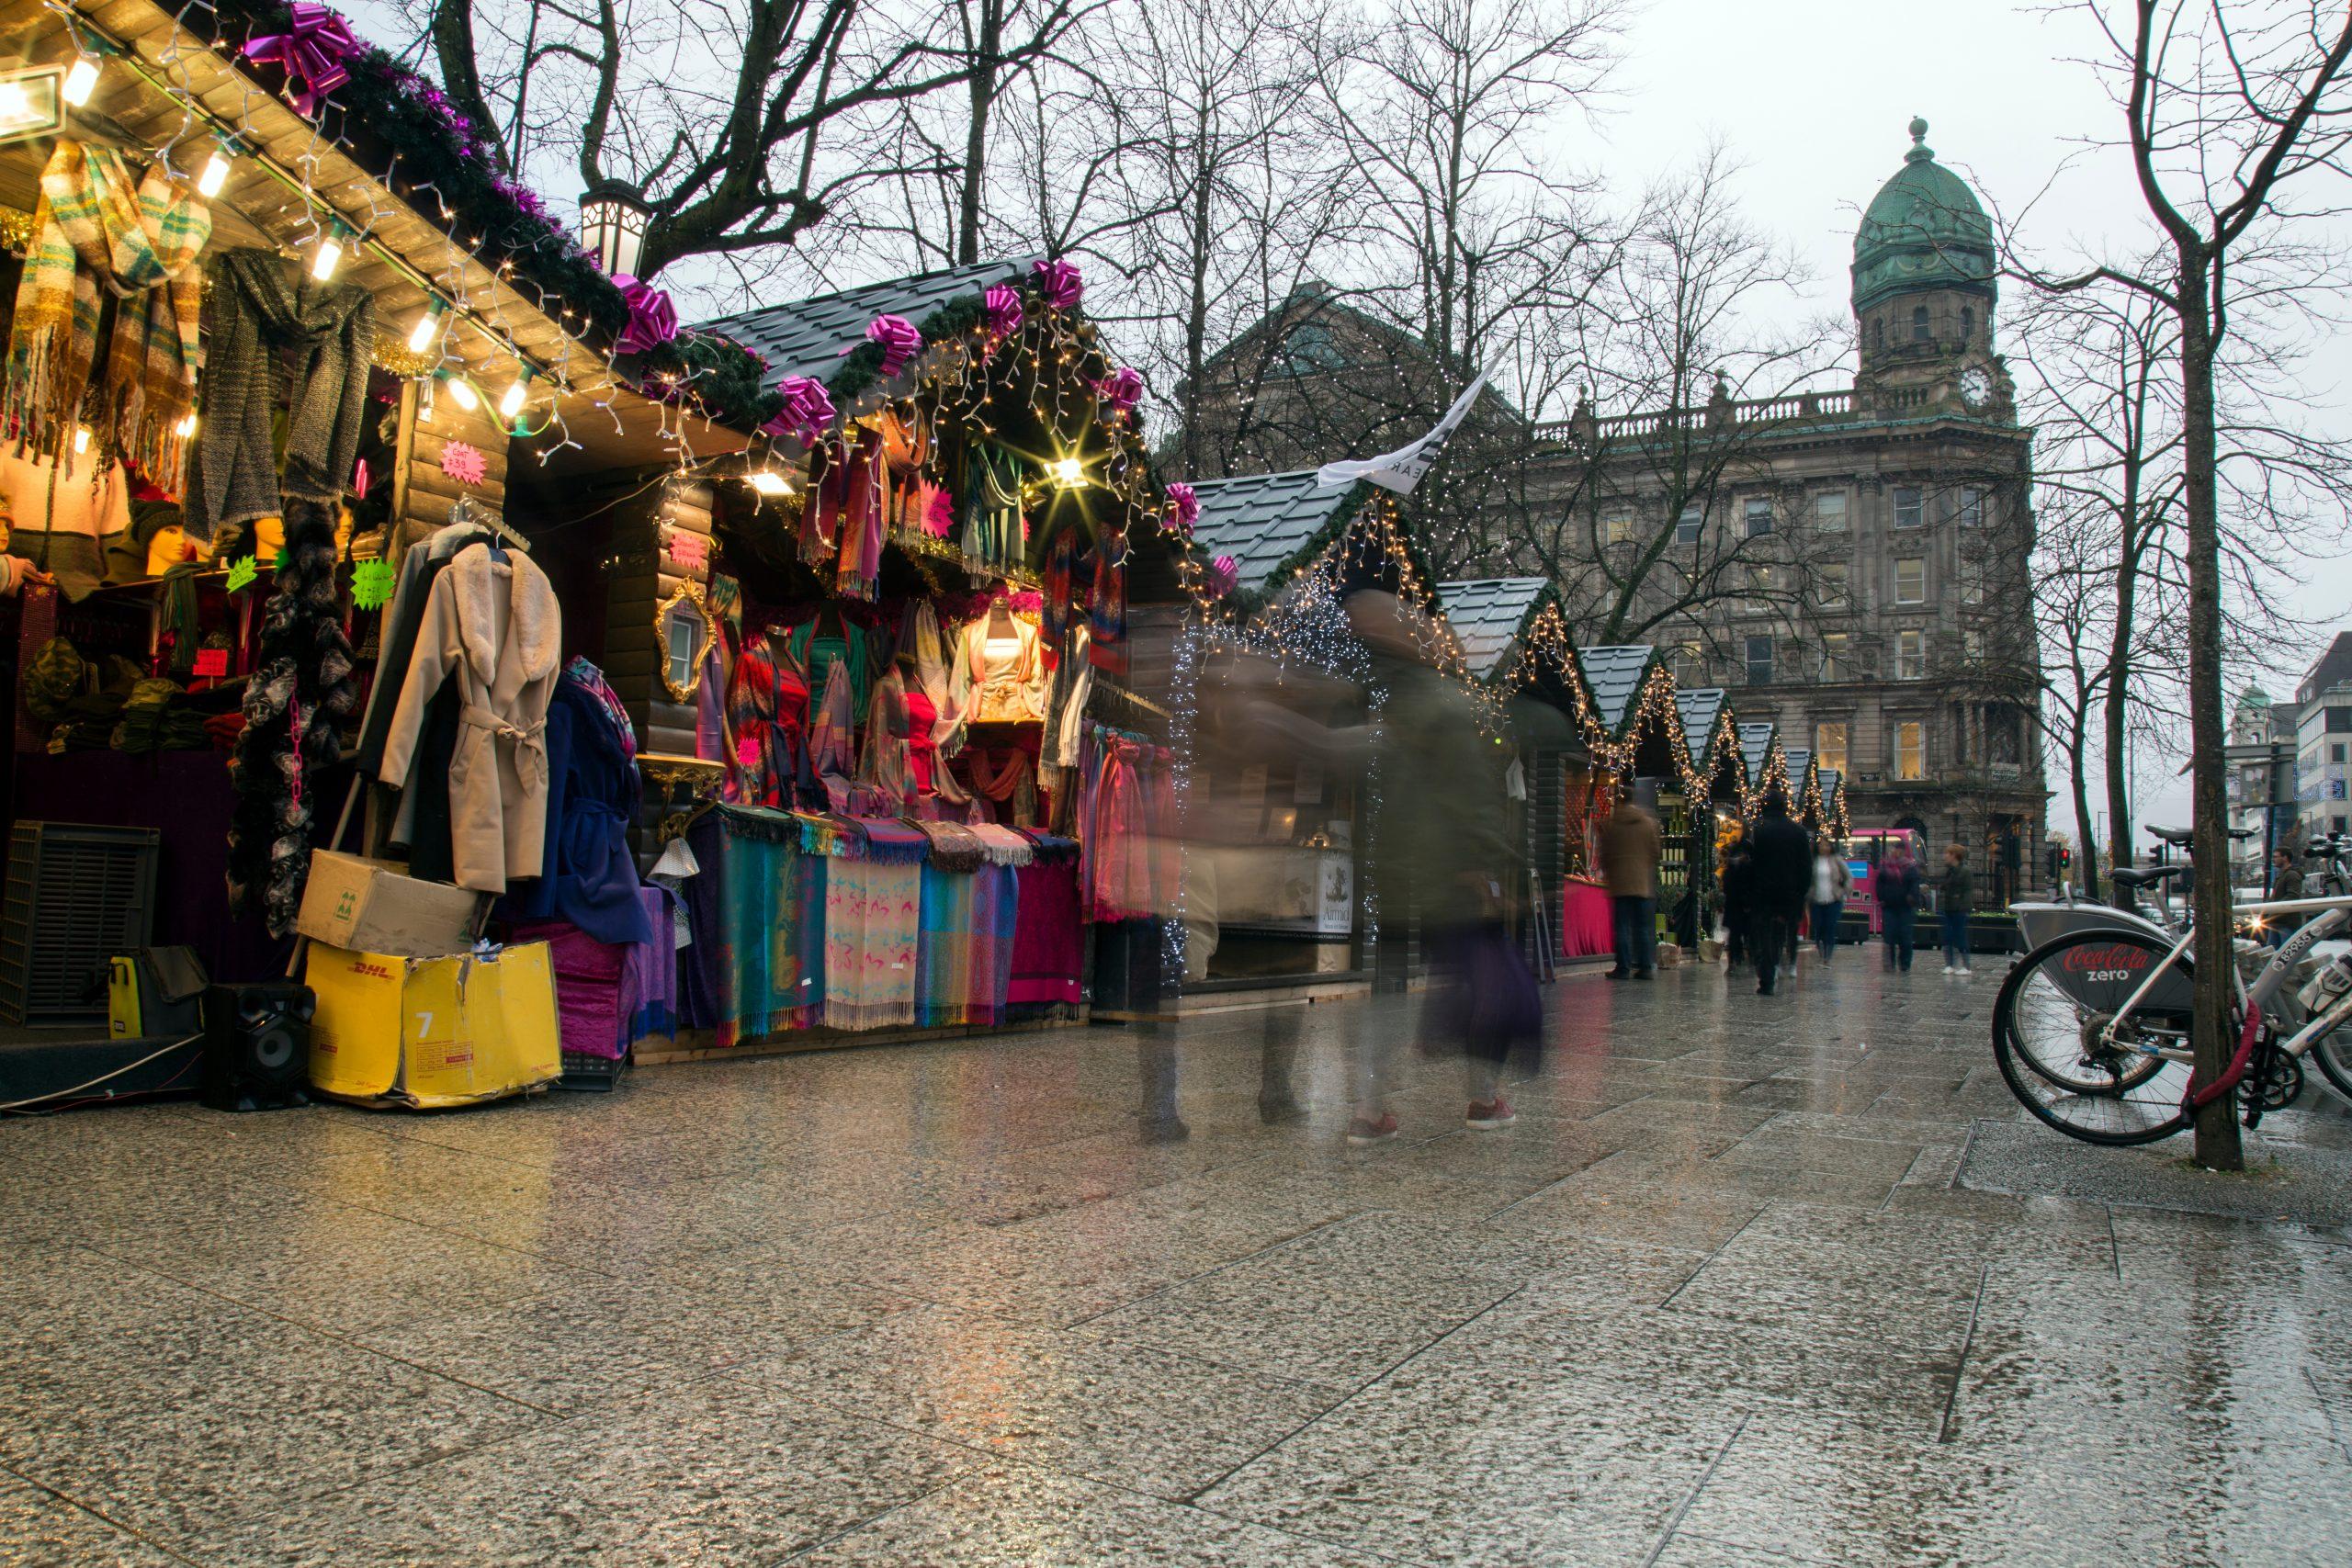 Belfast needs a breath of fresh air – footfall down by half